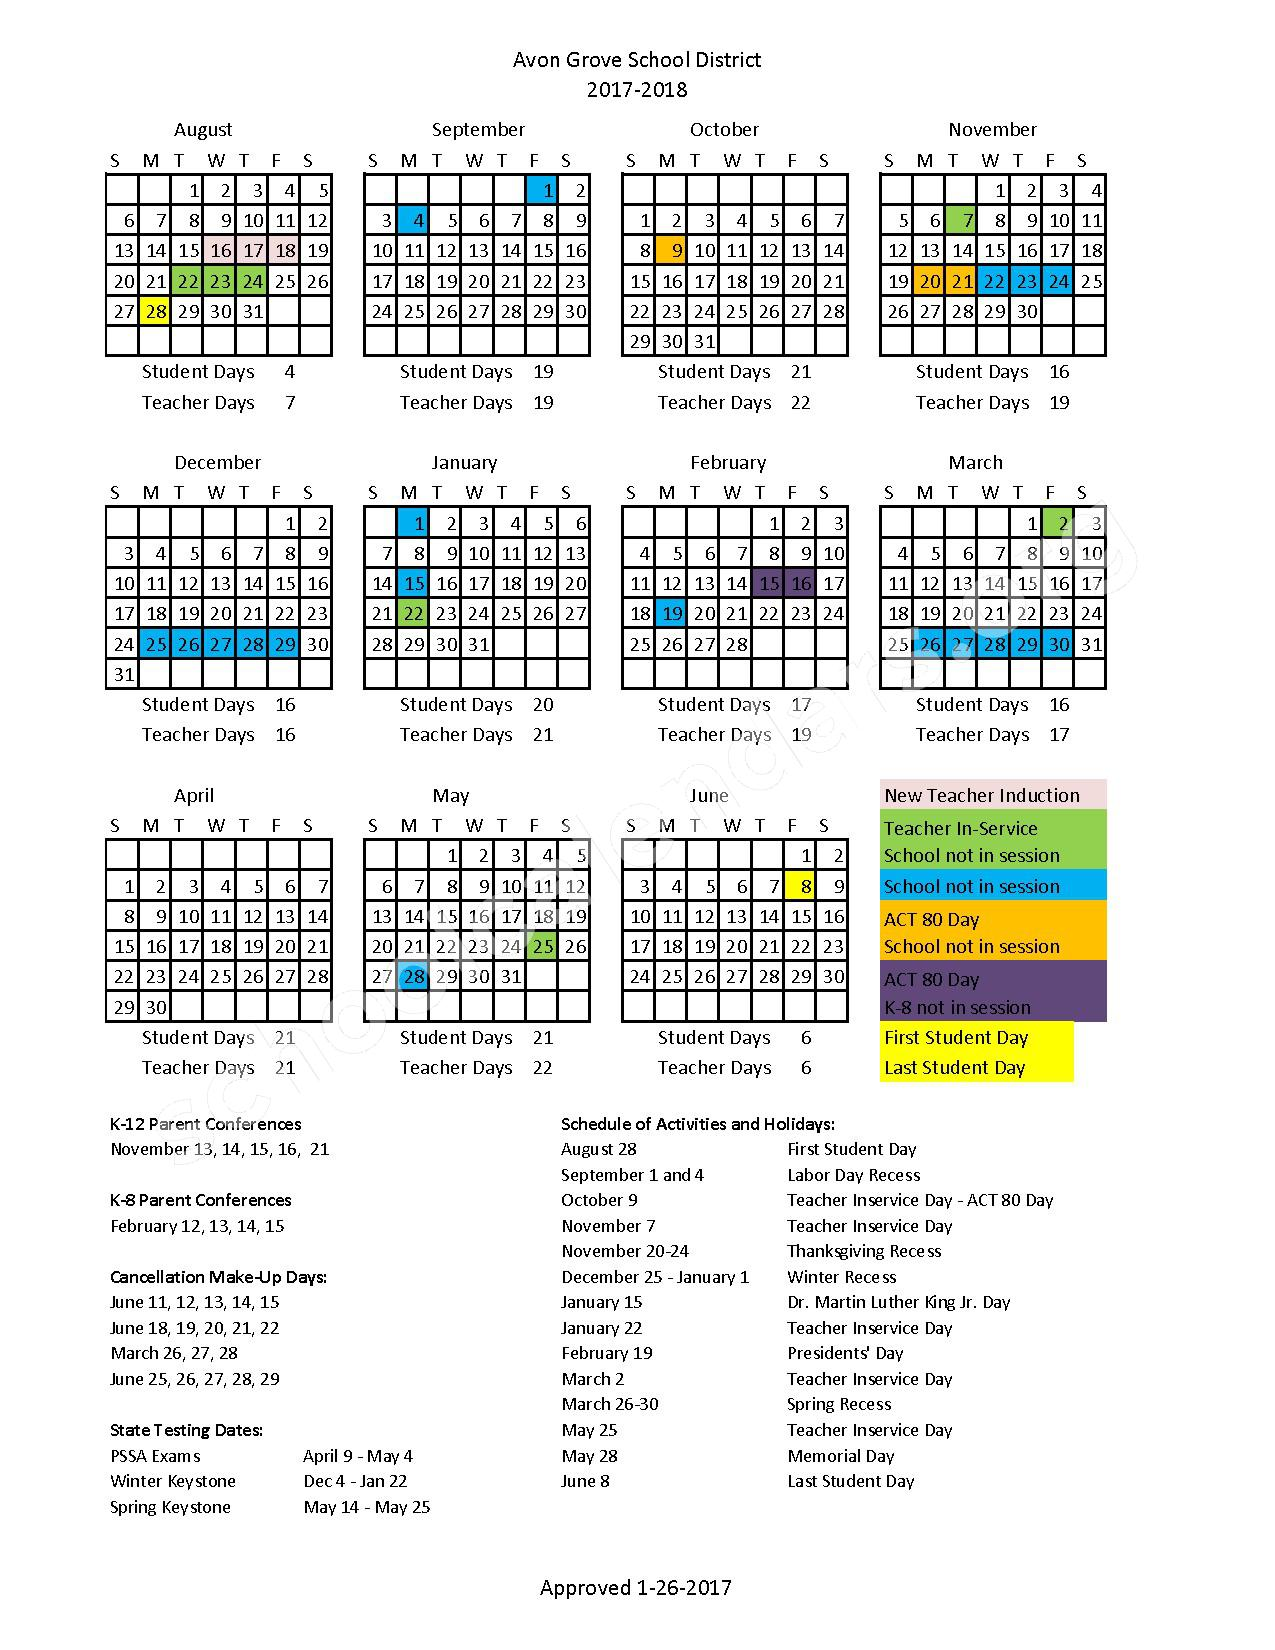 2017 - 2018 School Calendar – Avon Grove School District – page 1